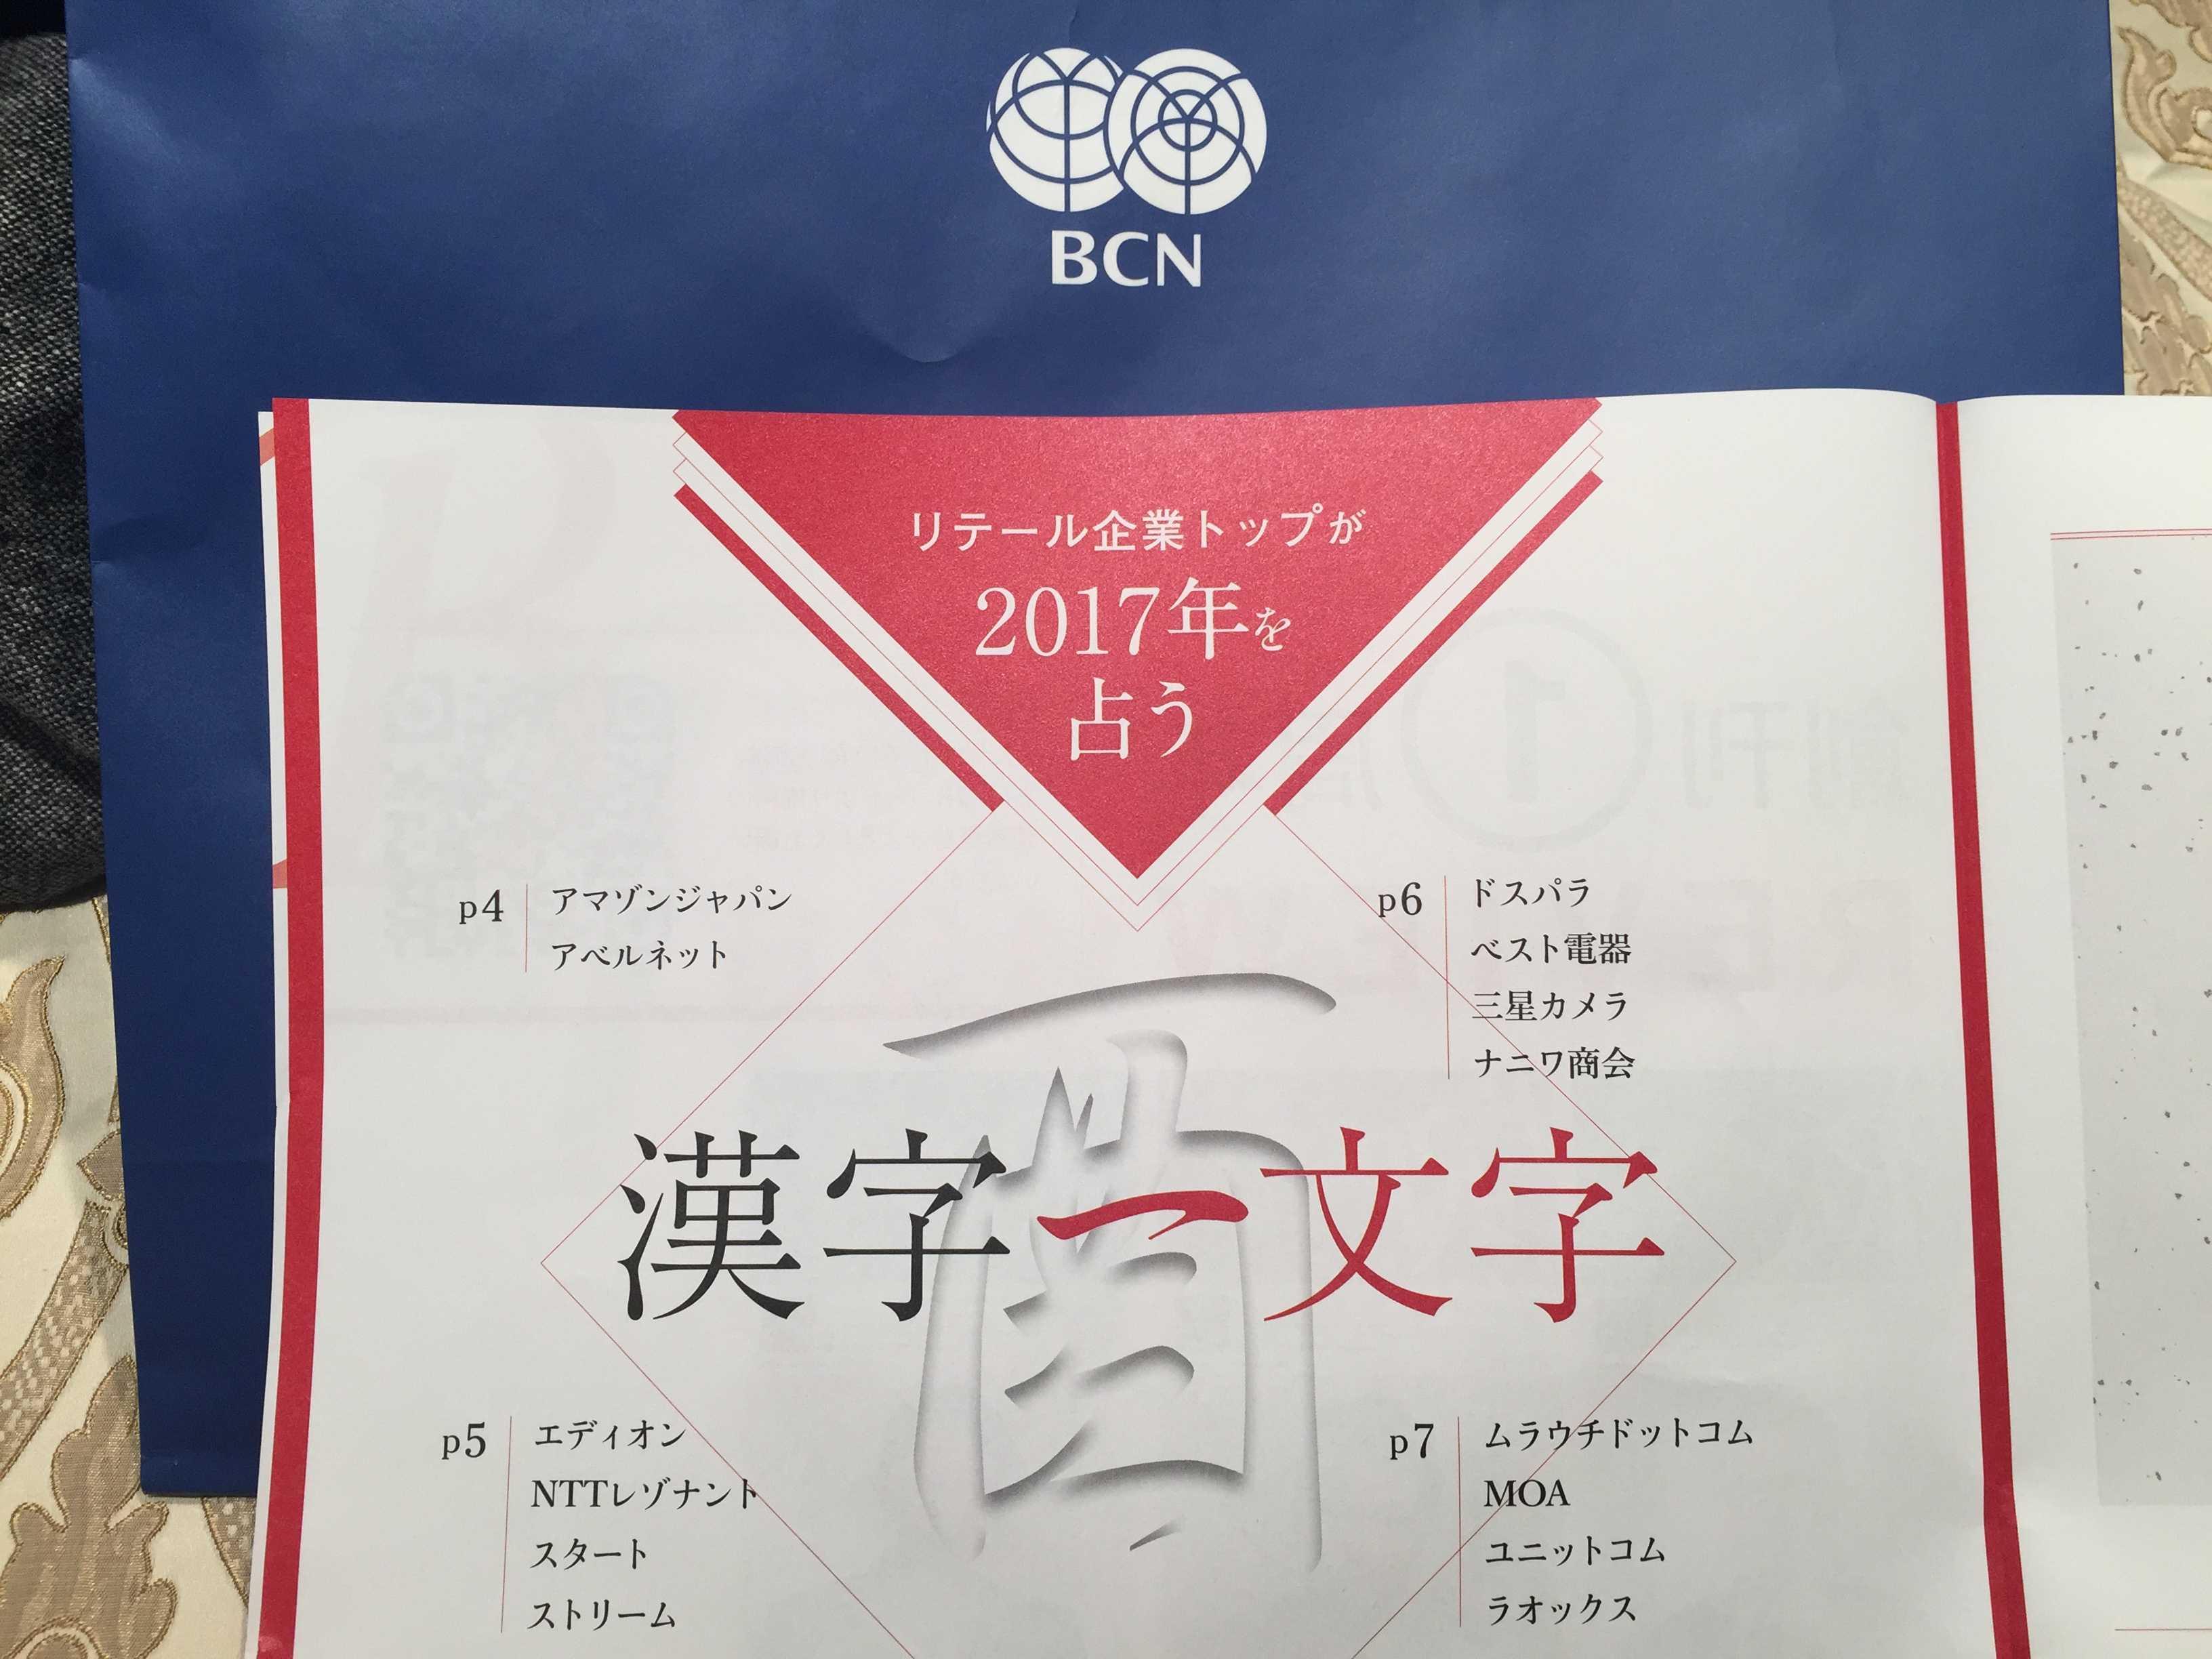 BCN: リテール企業トップが 2017年を占う漢字一文字